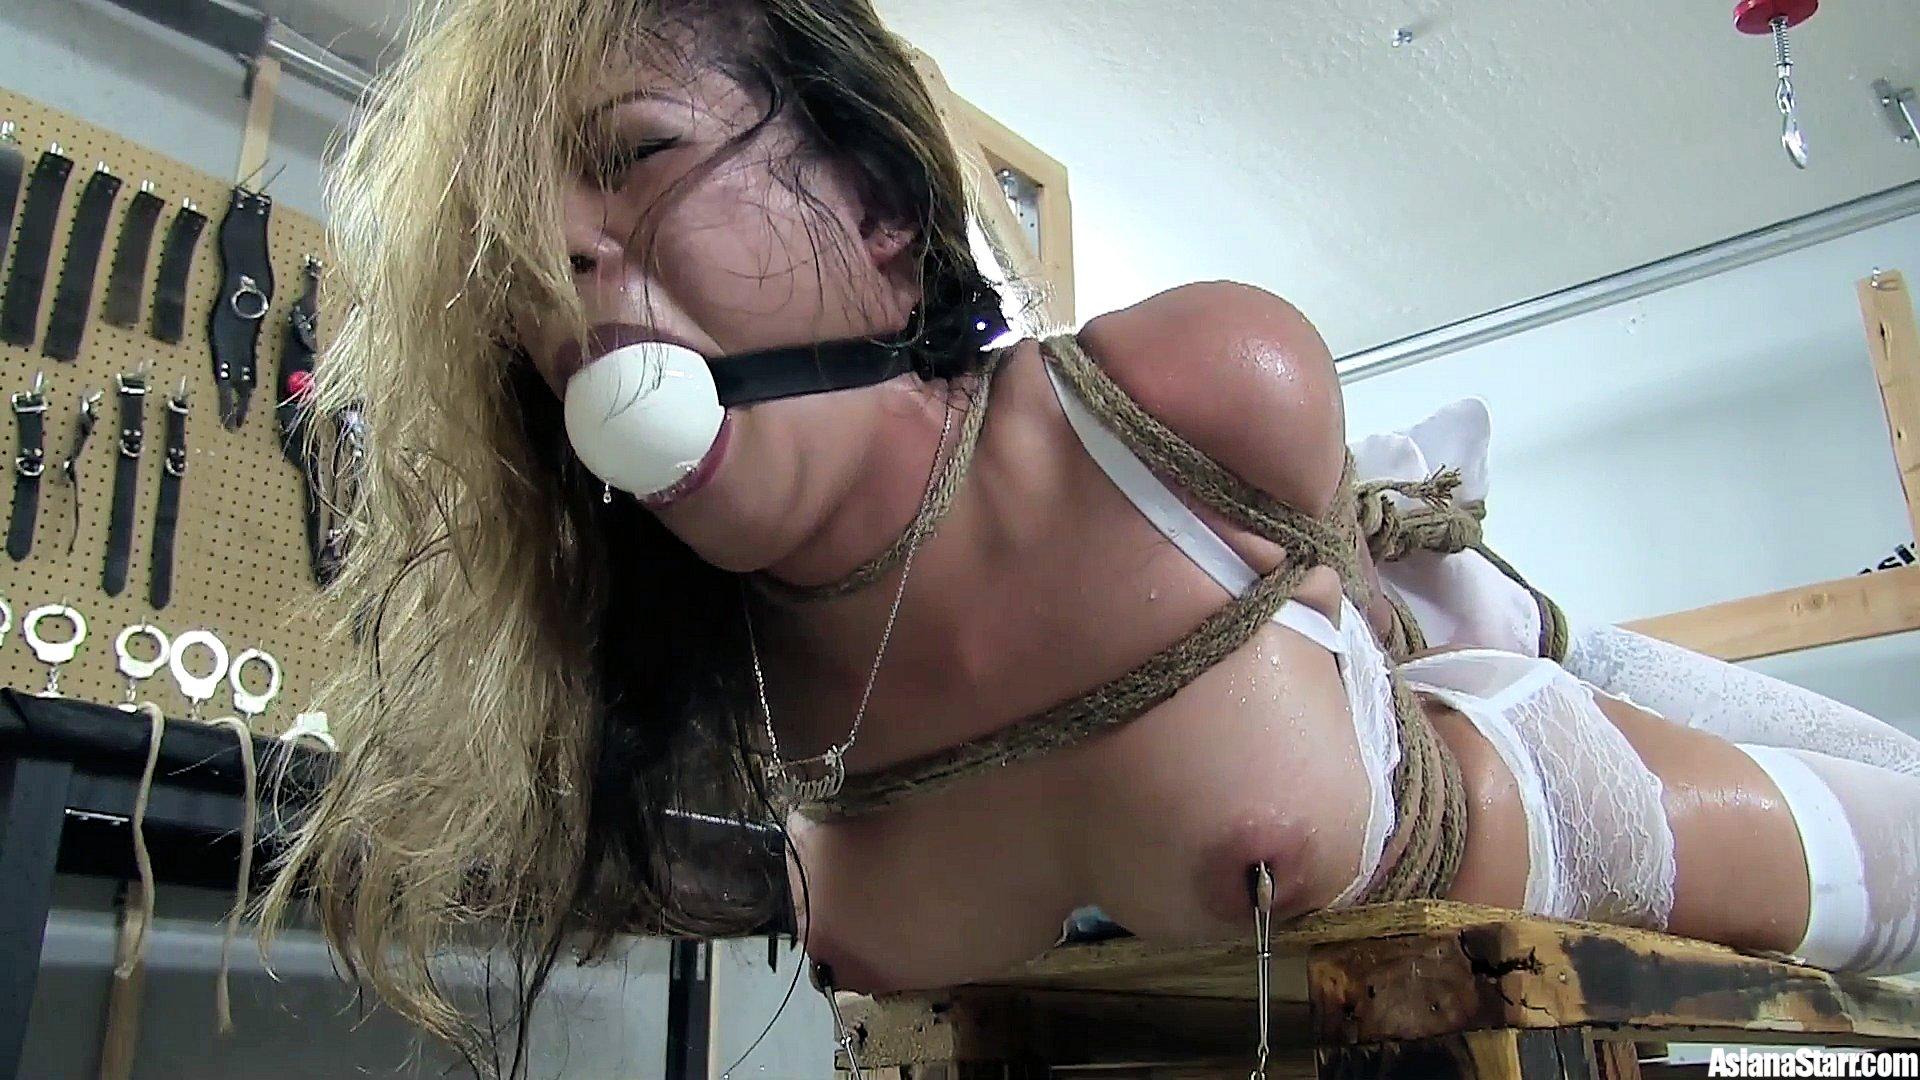 Doctor boob exam porn